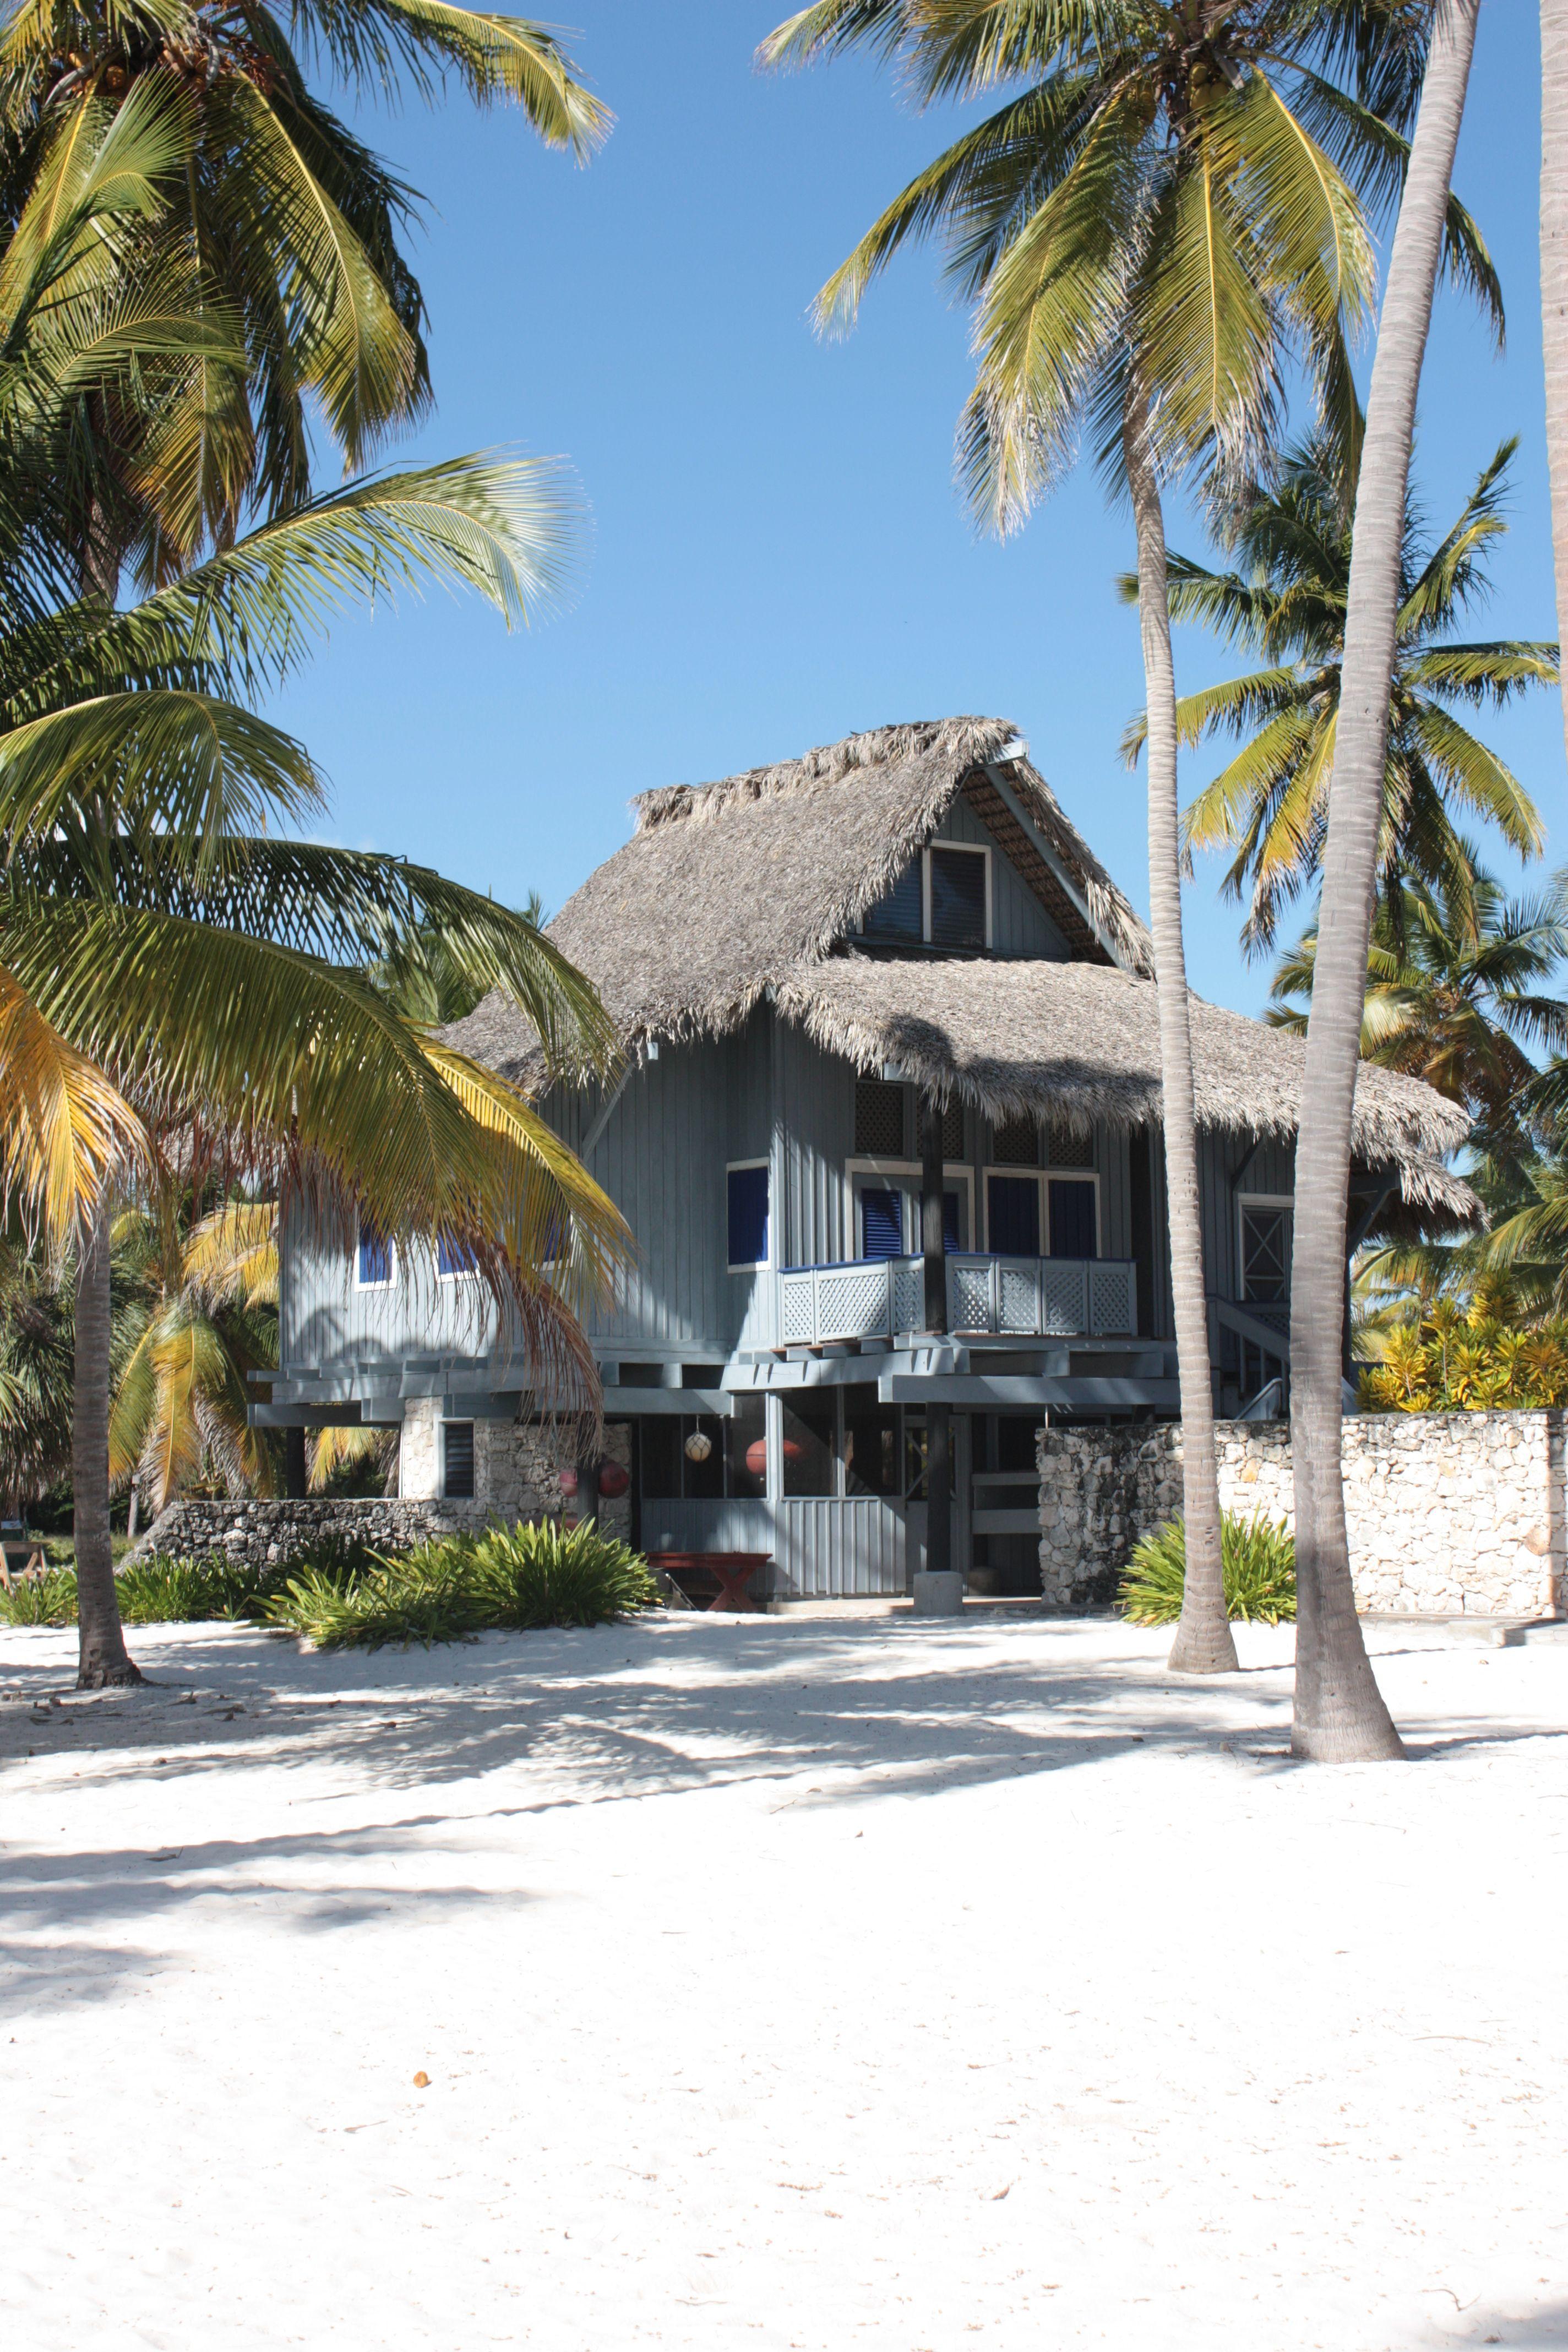 Beach House At Saona Island Dominican Republic Saona Island Haiti And Dominican Republic Punta Cana Dominican Republic